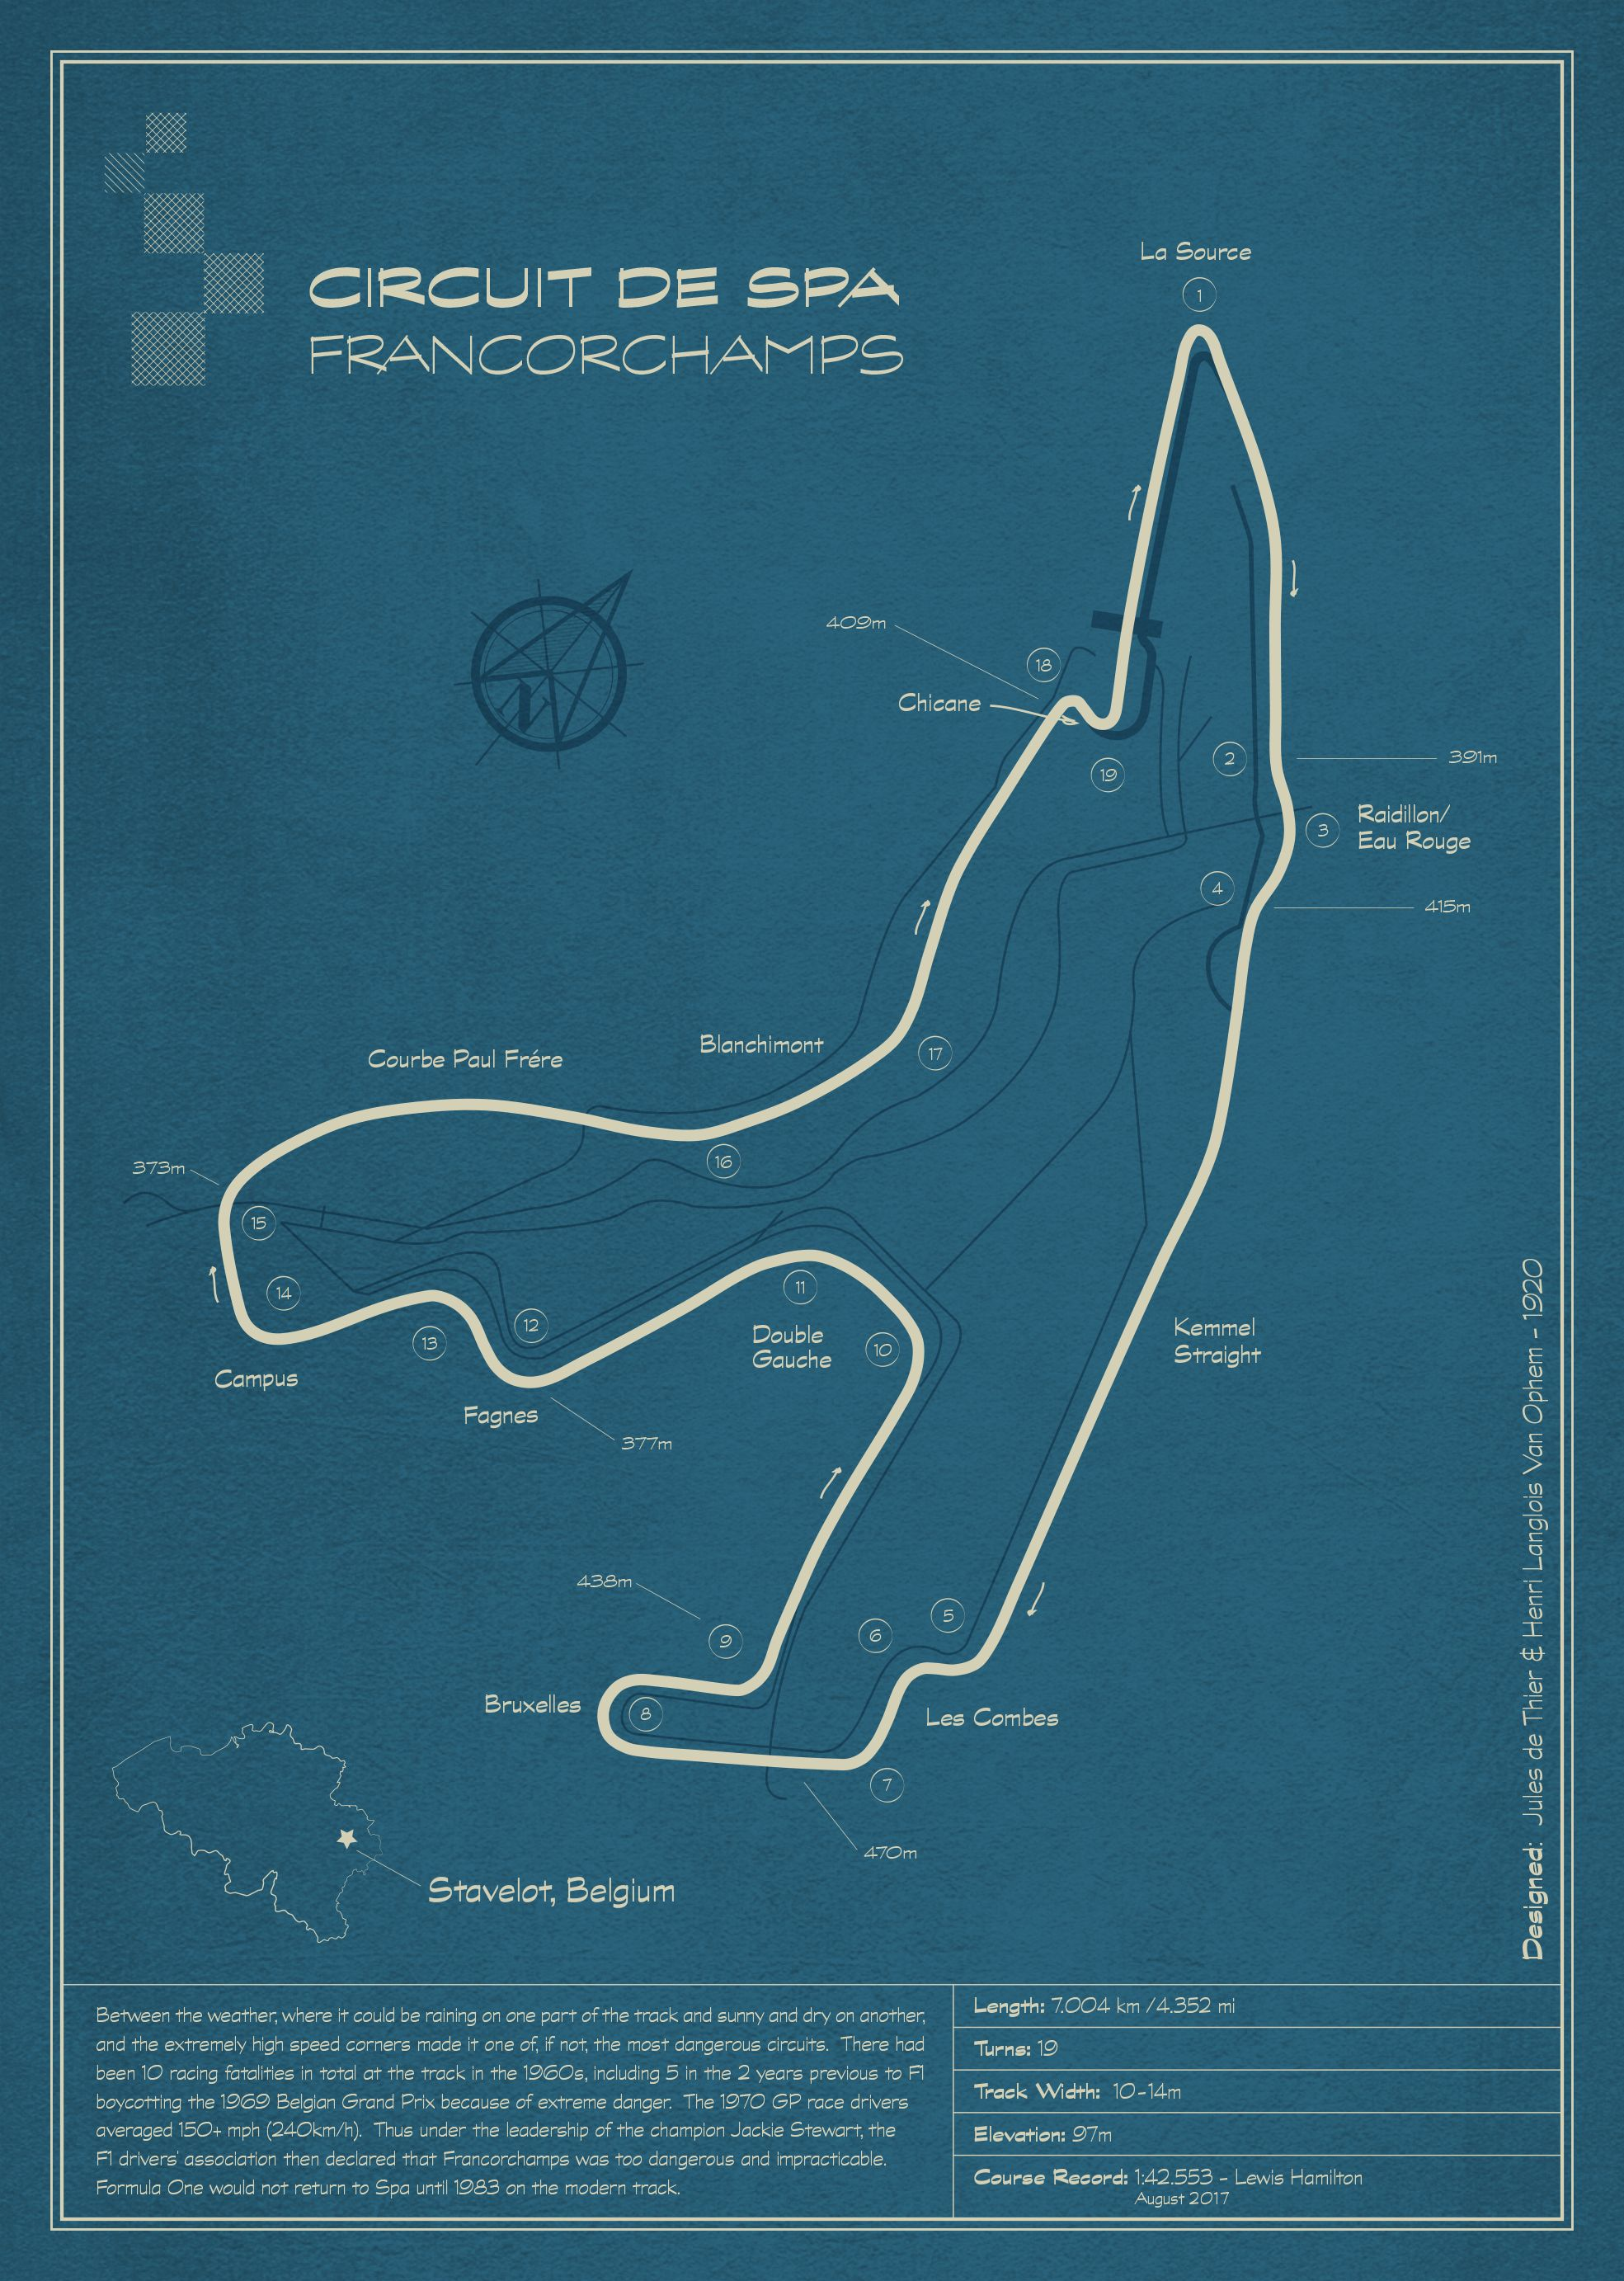 Pin On Racing Circuit Maps